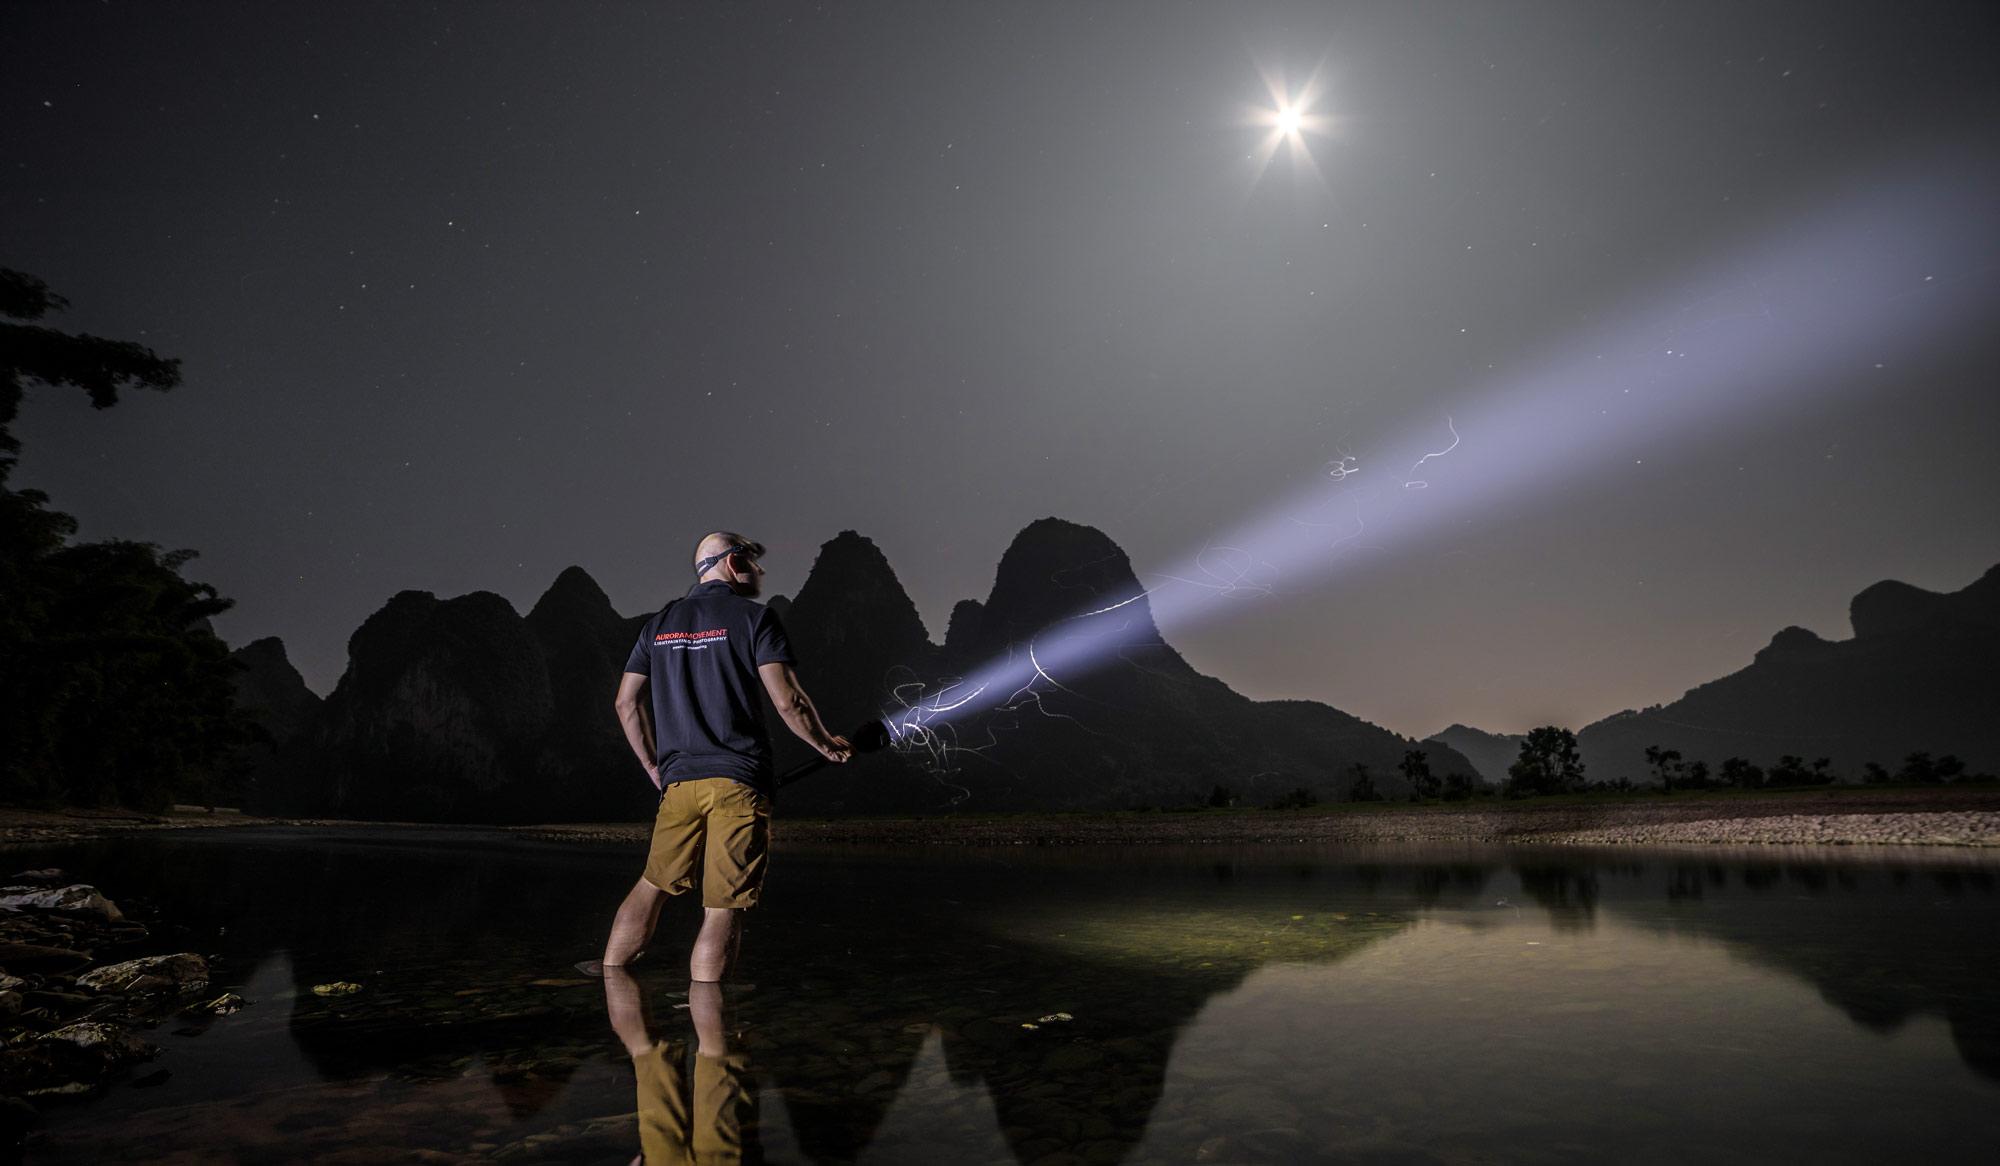 Flashlights-for-LightPainting-Gunnar-Heilmann_XingPing-LedLEnser-X21.jpg